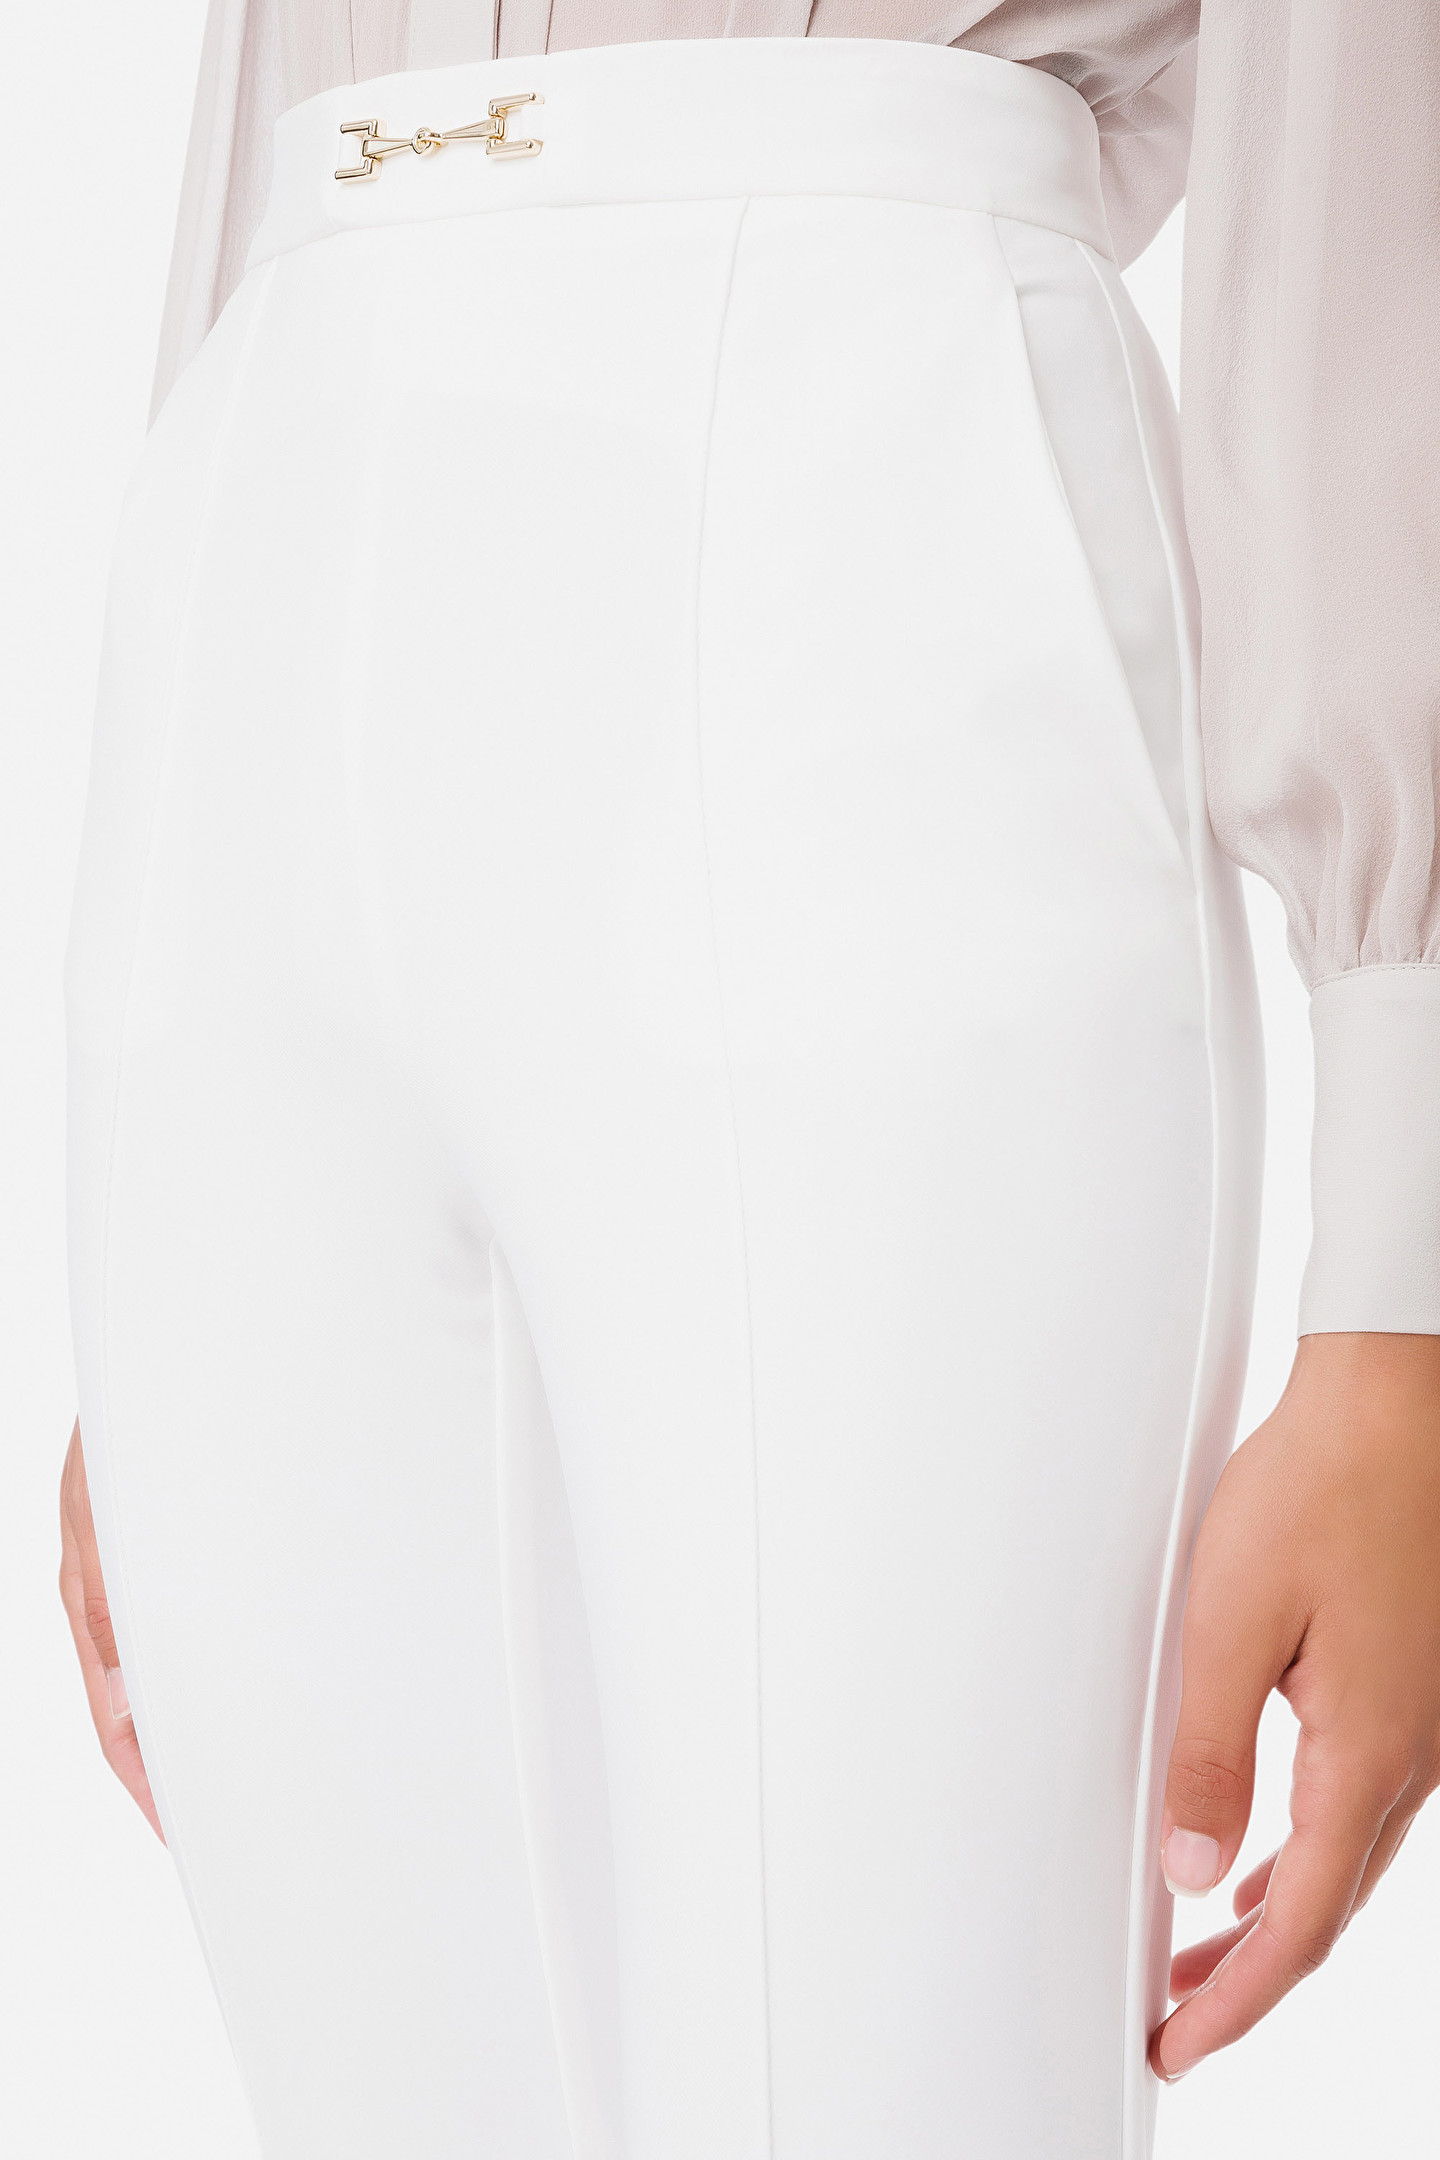 Pantalone skinny essential donna color avorio Elisabetta Franchi | PA38216E2360